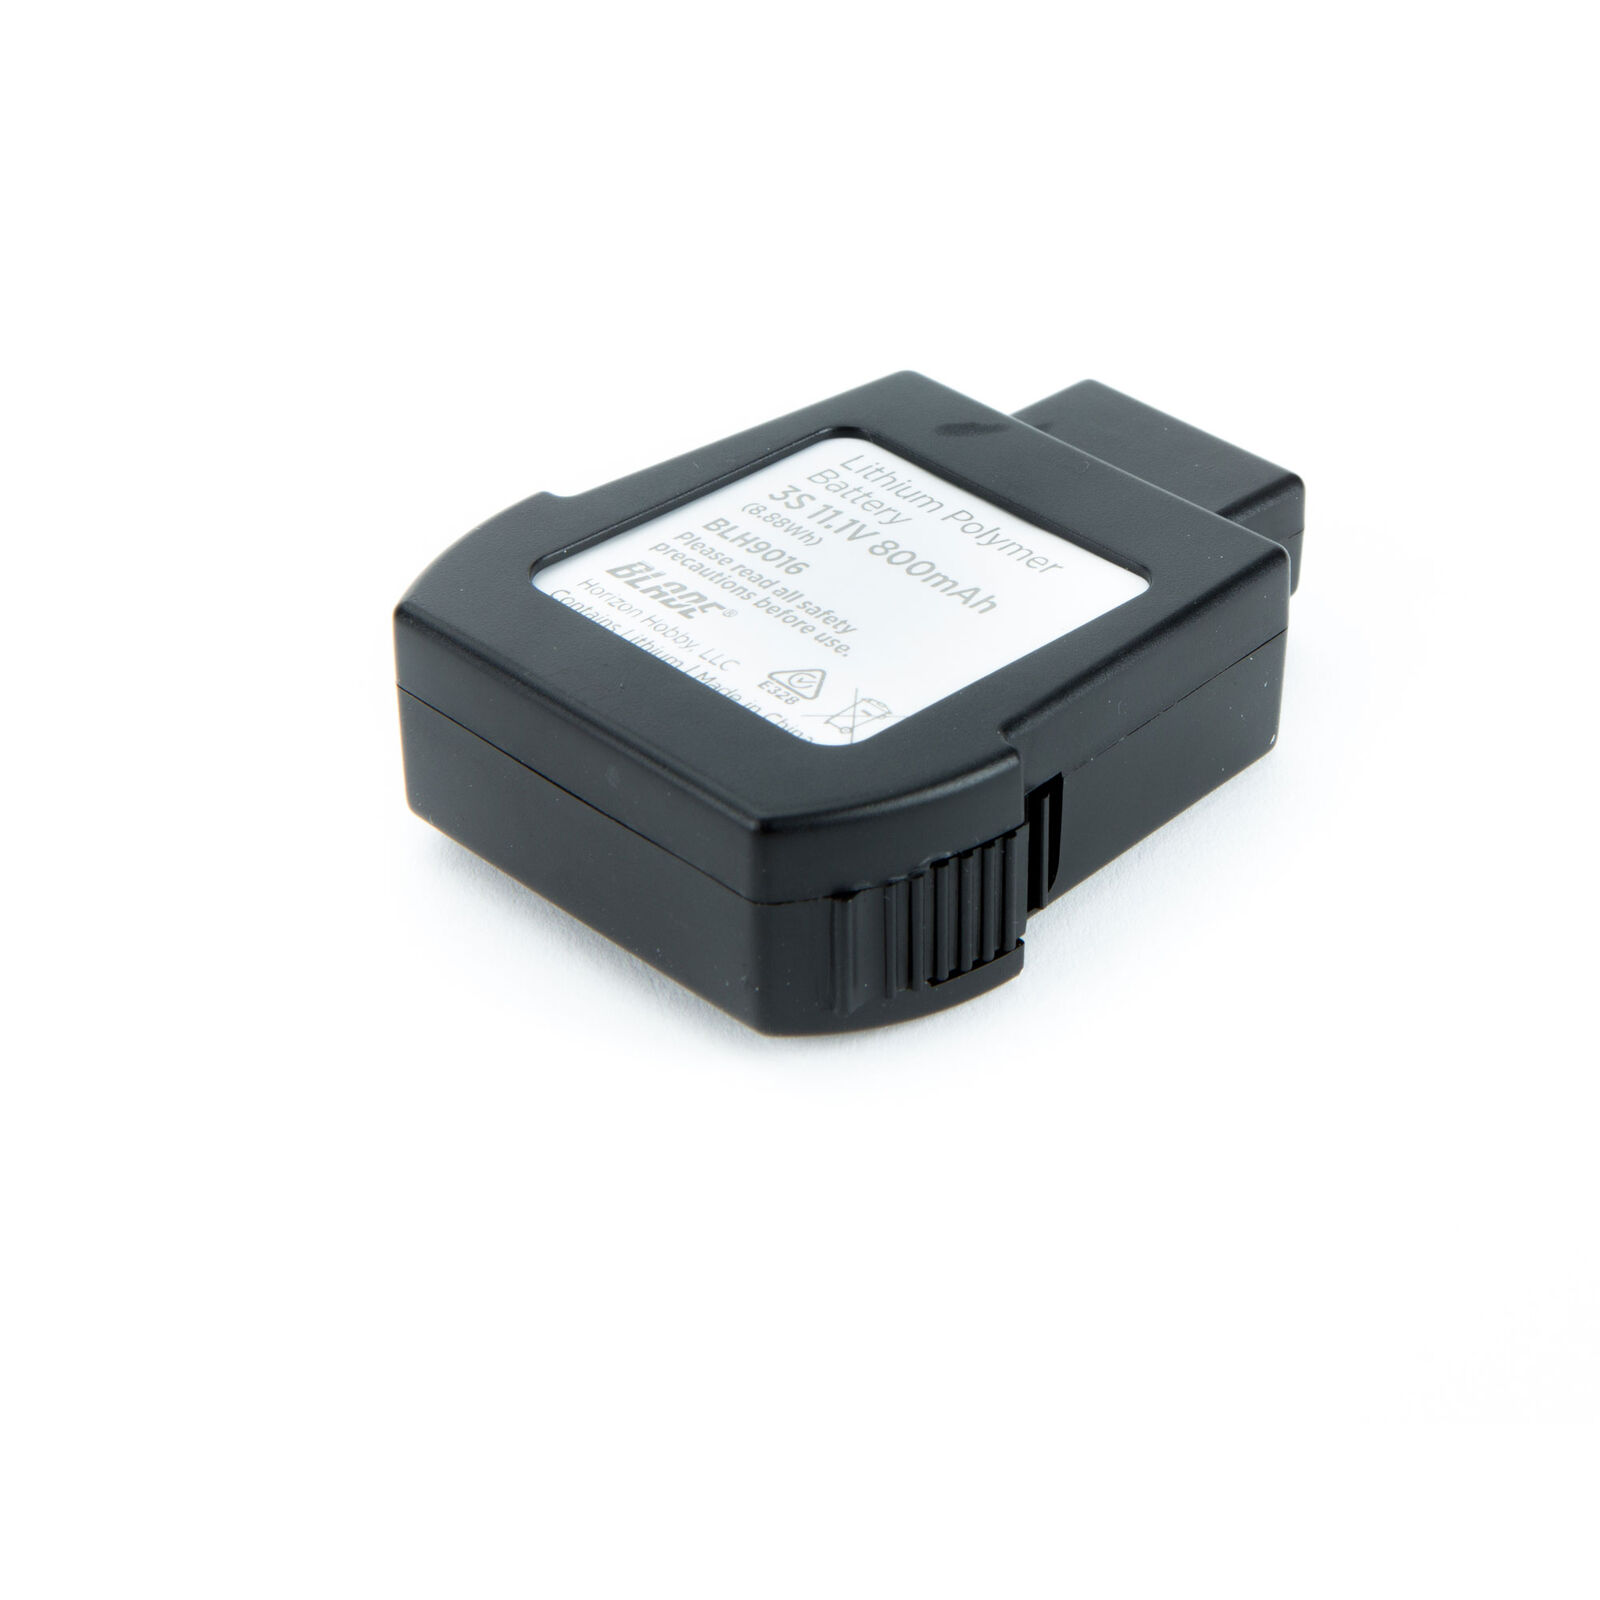 11.1V 800mAh 3S LiPo Battery: Inductrix 200